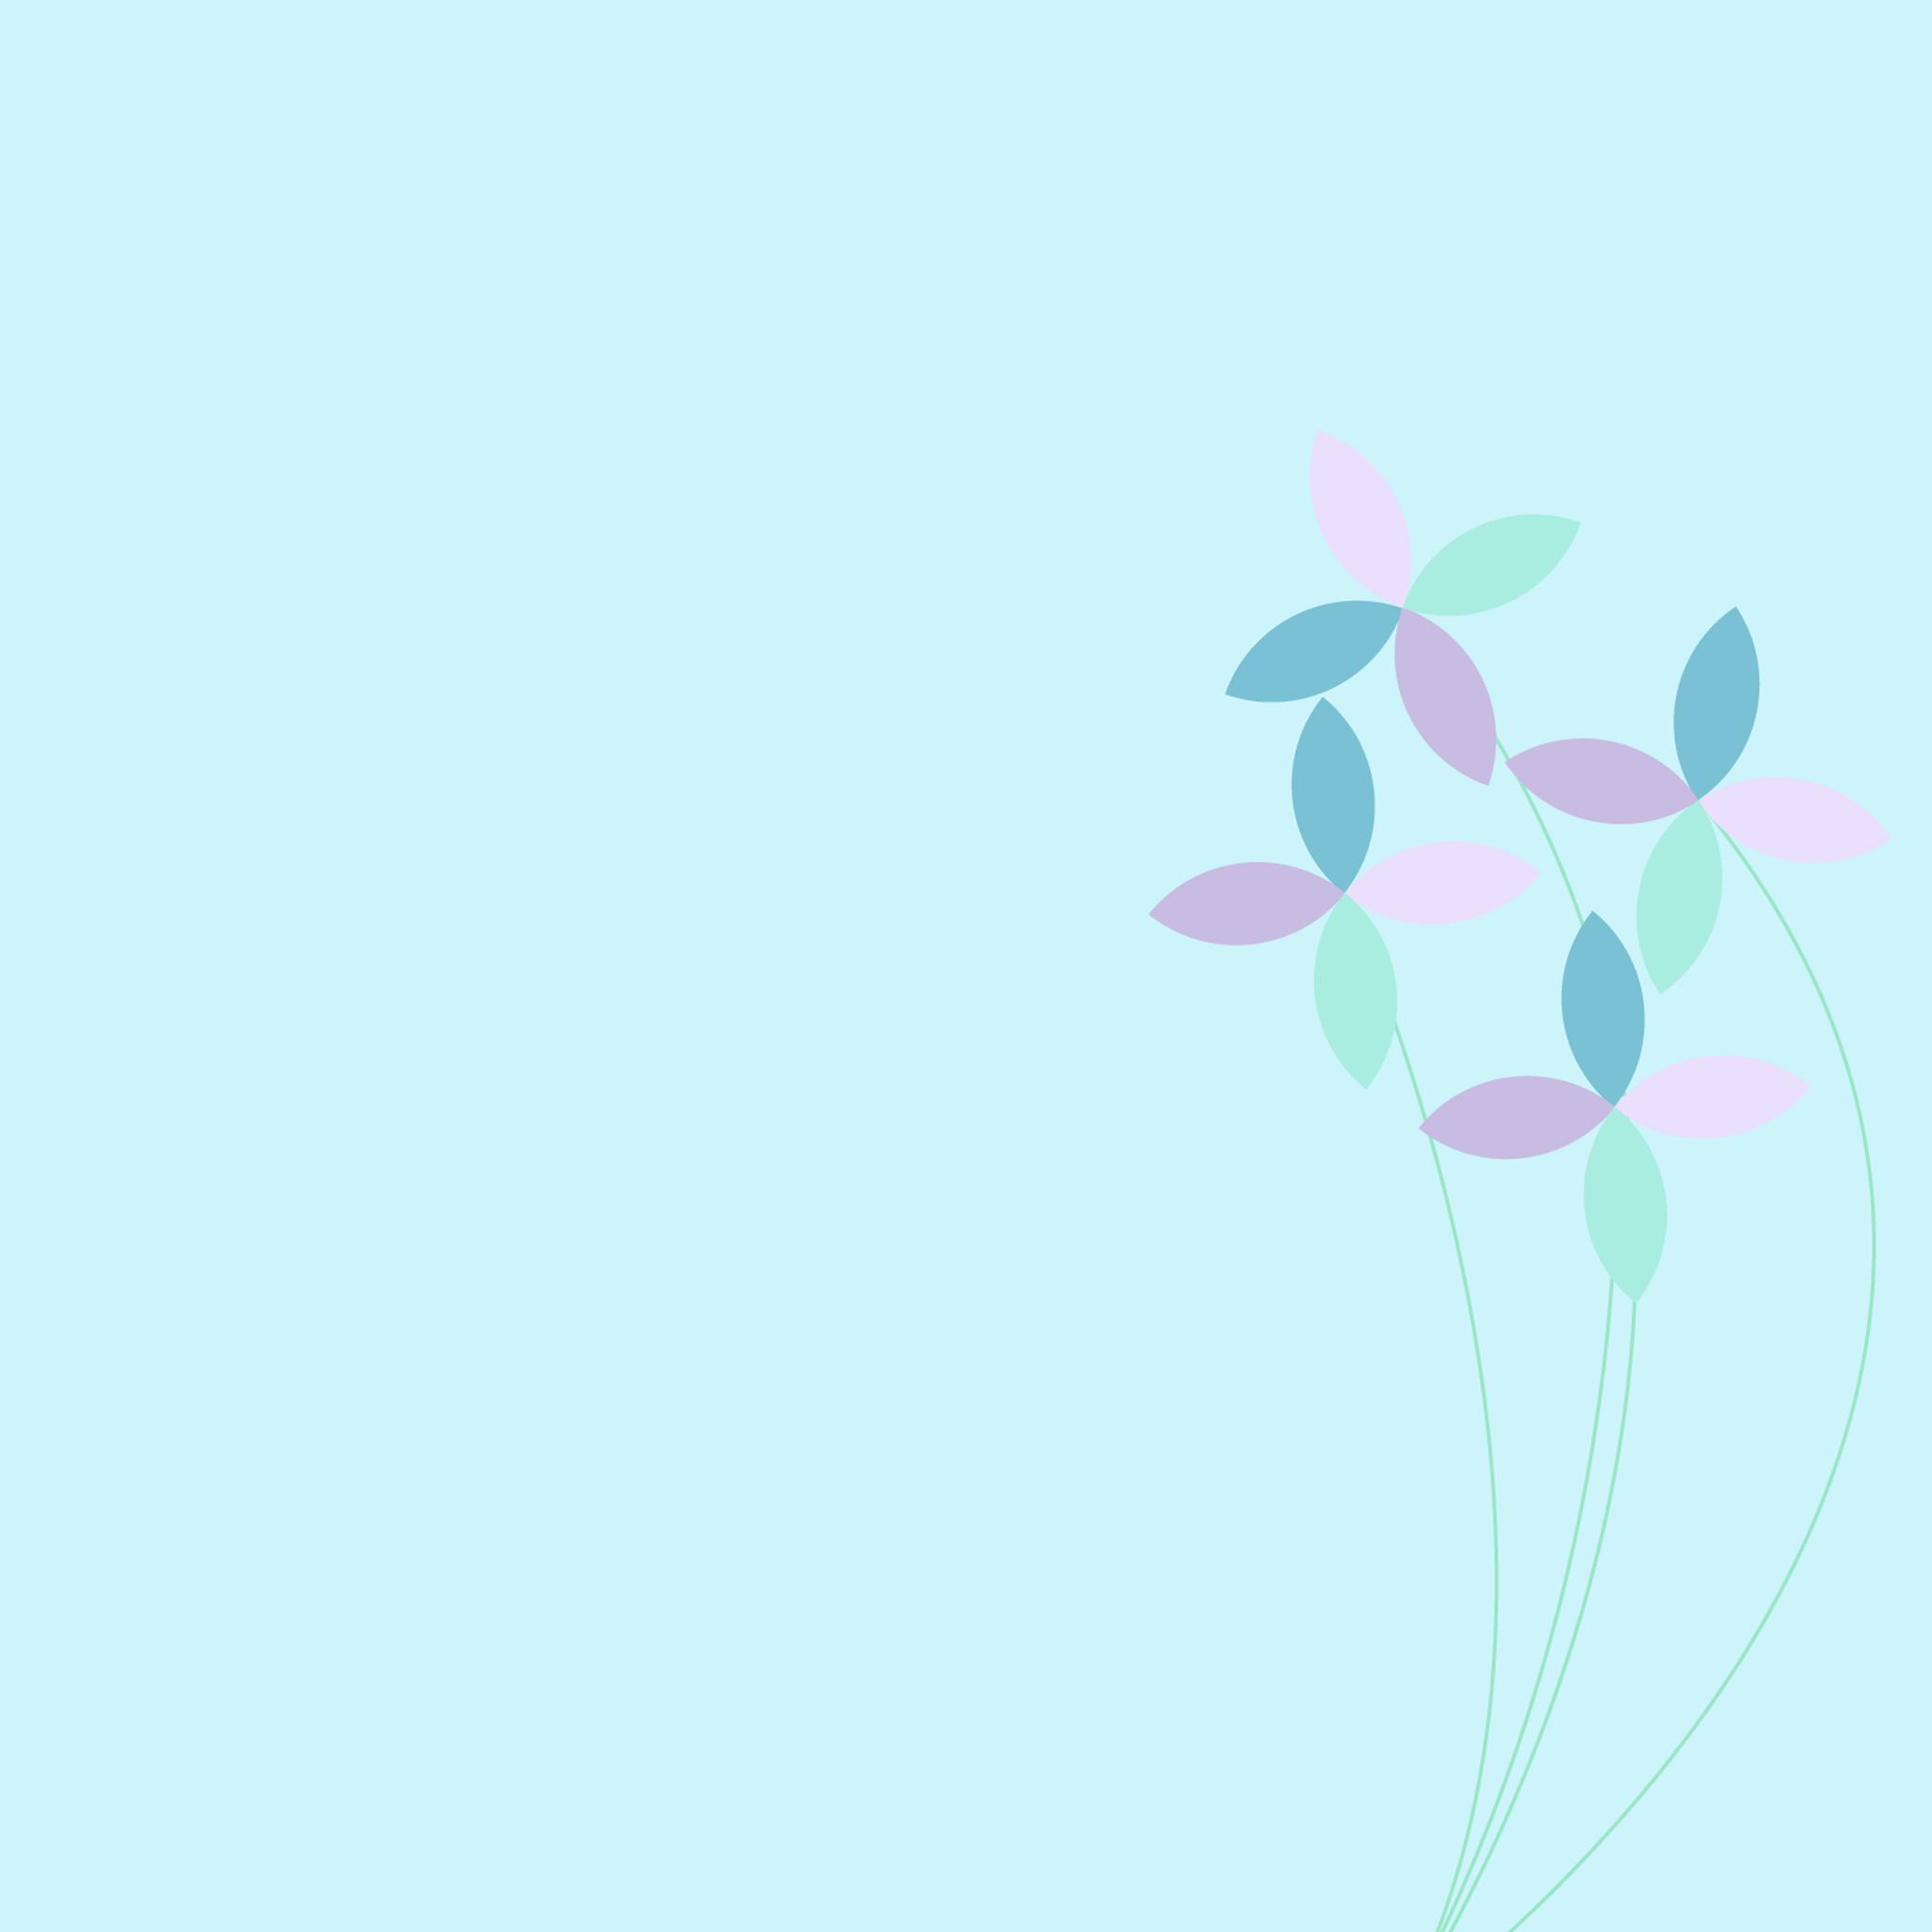 Flower-Power-3Wallpapers-ipad-Retina